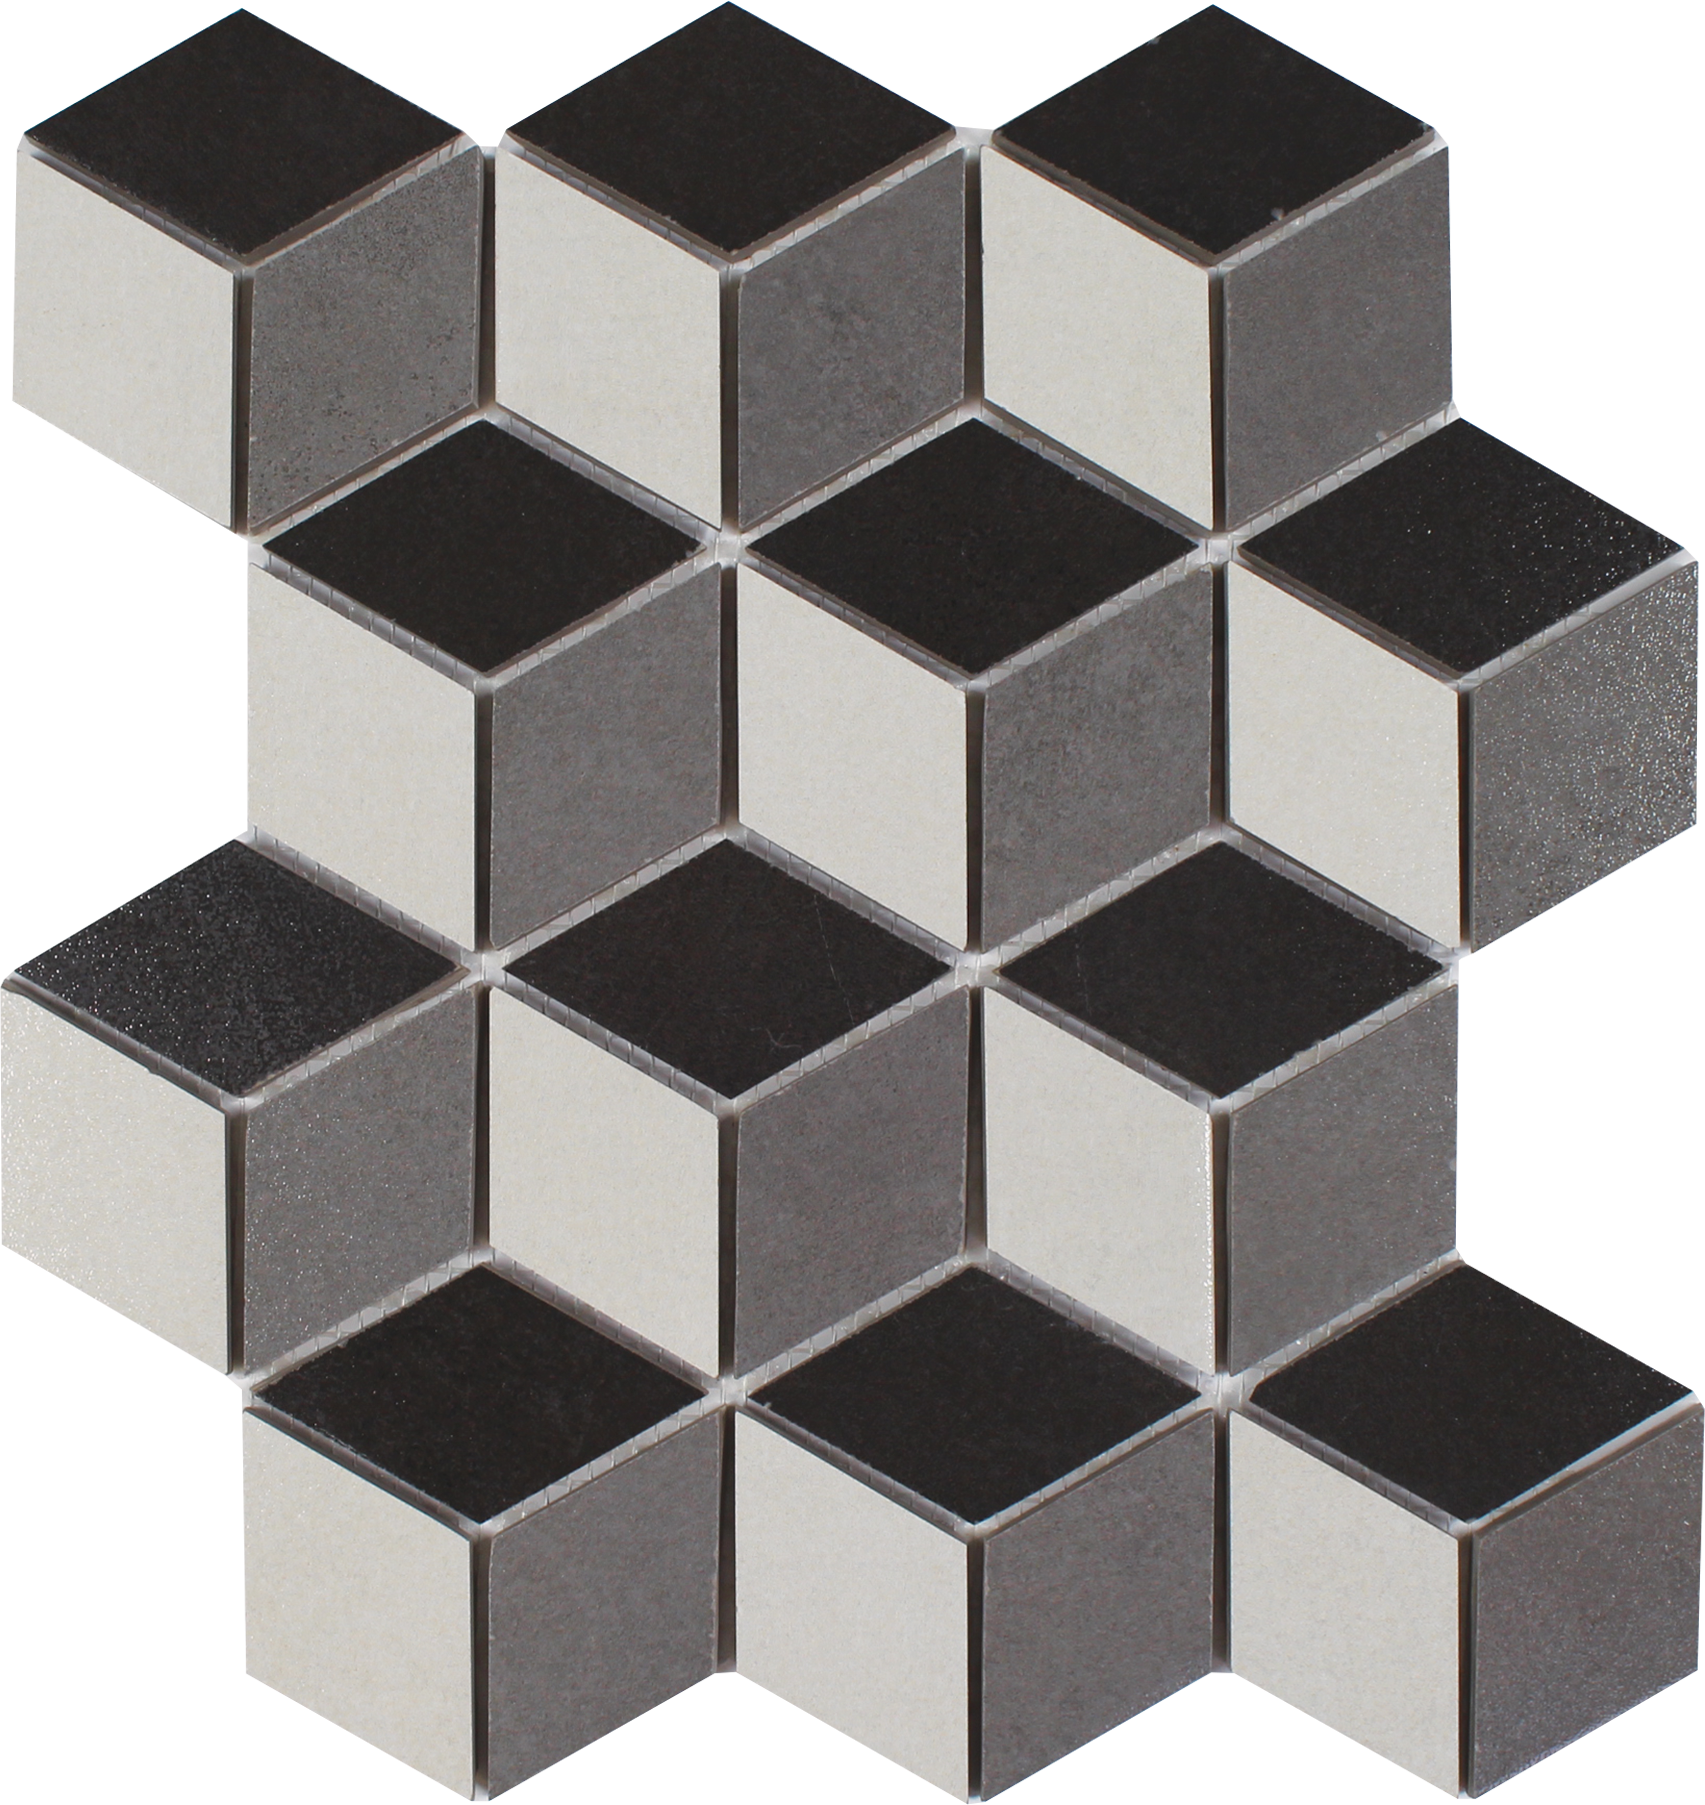 #412 Mosaic